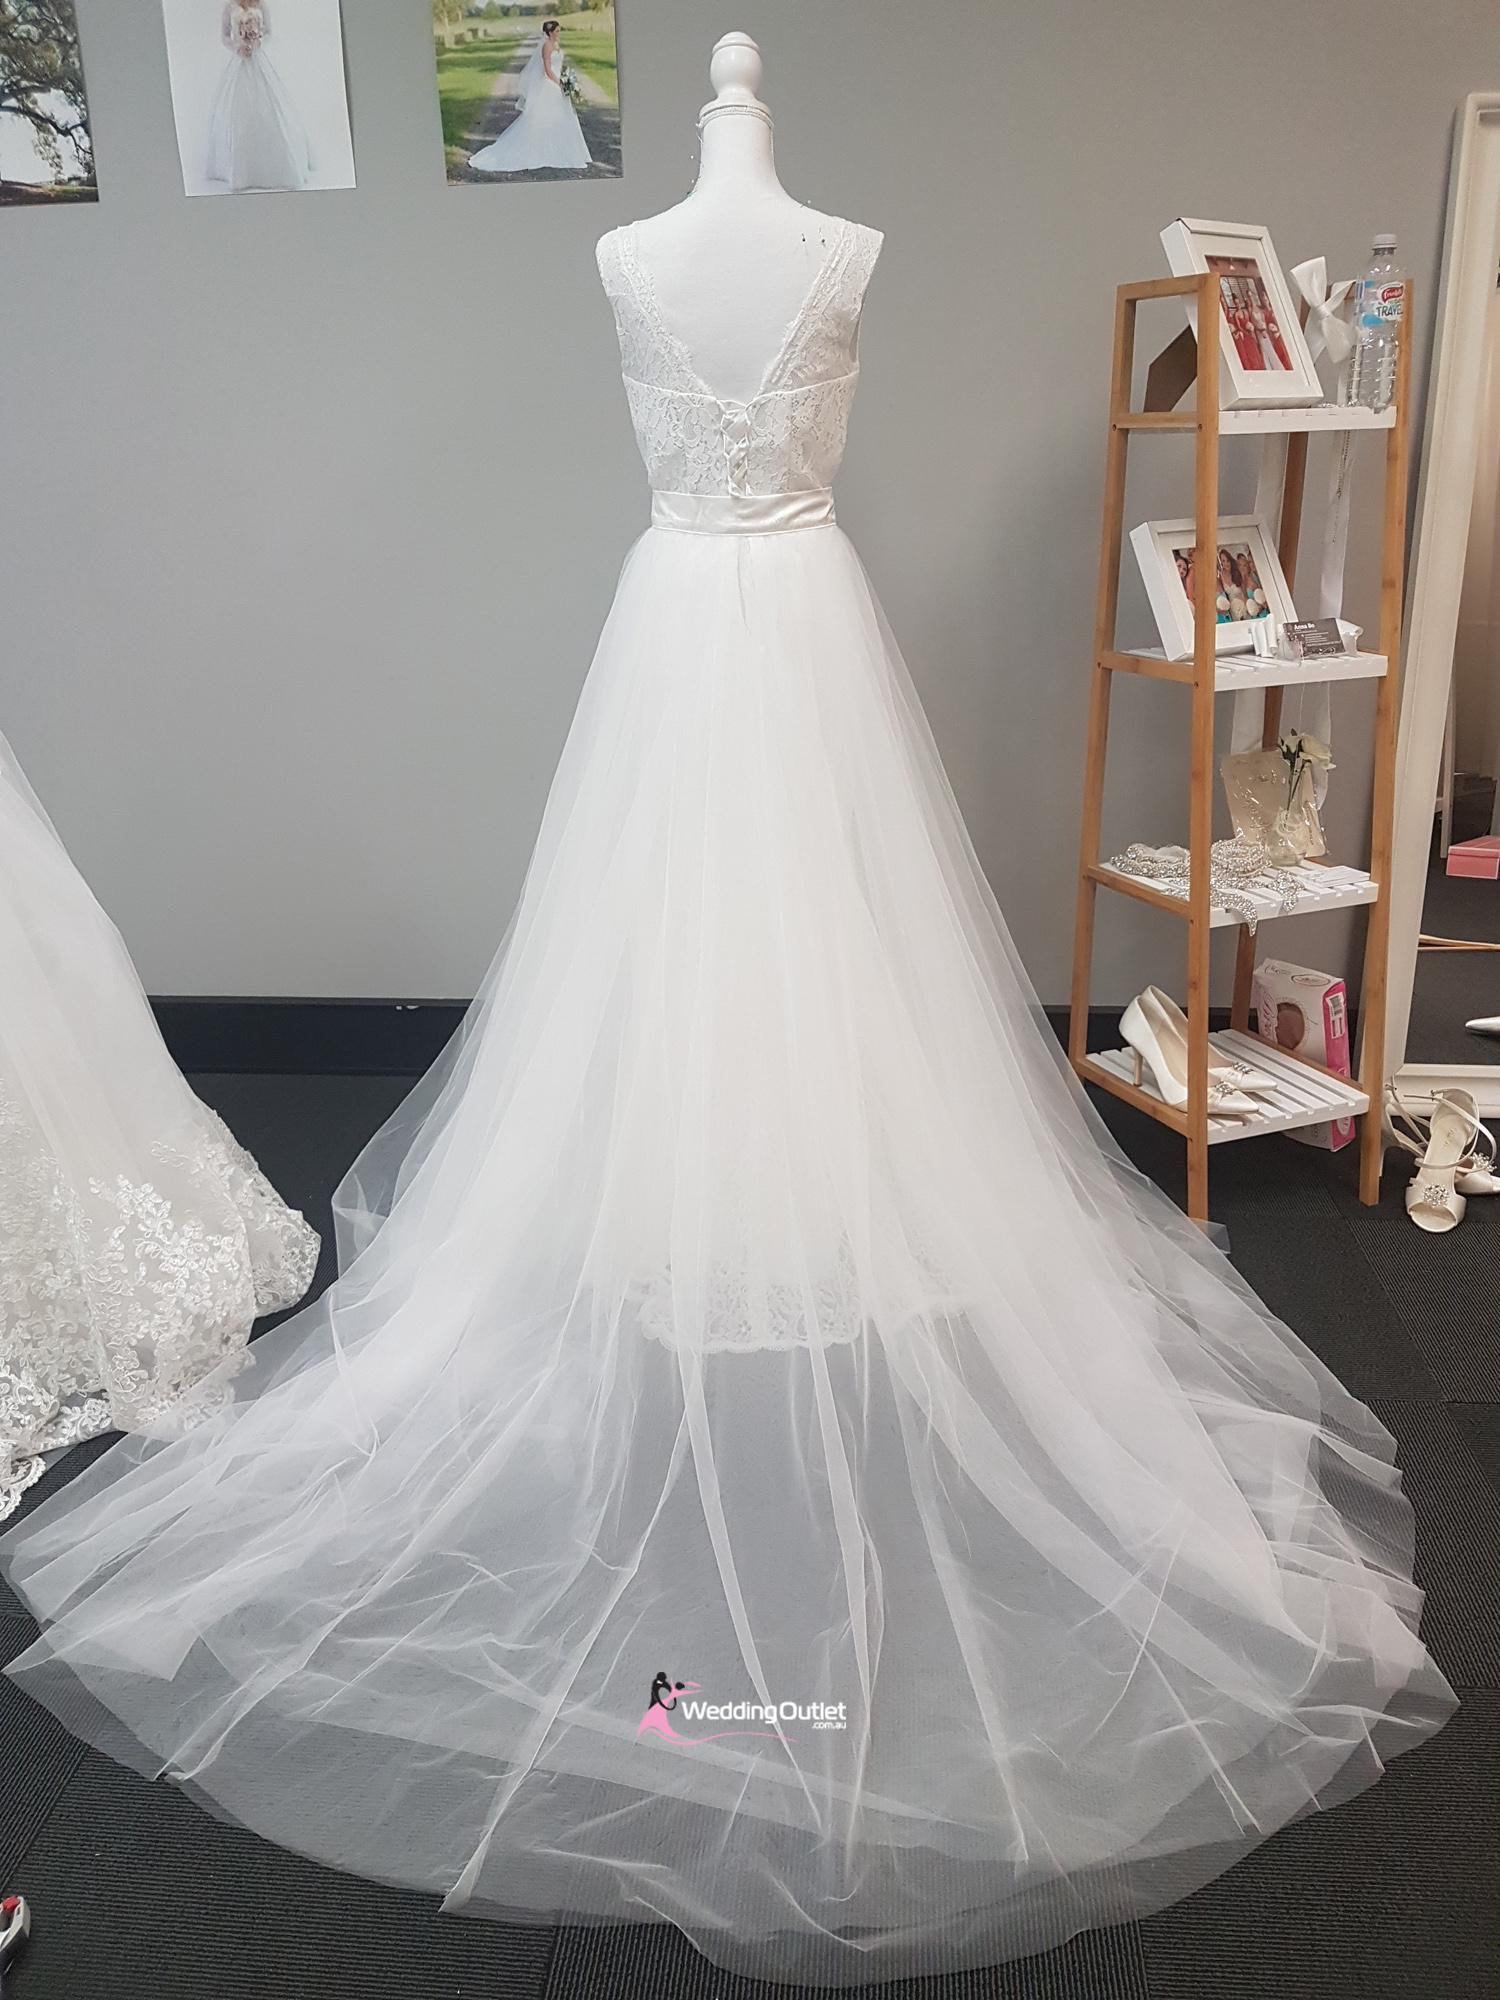 Rouen Mermaid Dress With Detachable Skirt Weddingoutlet